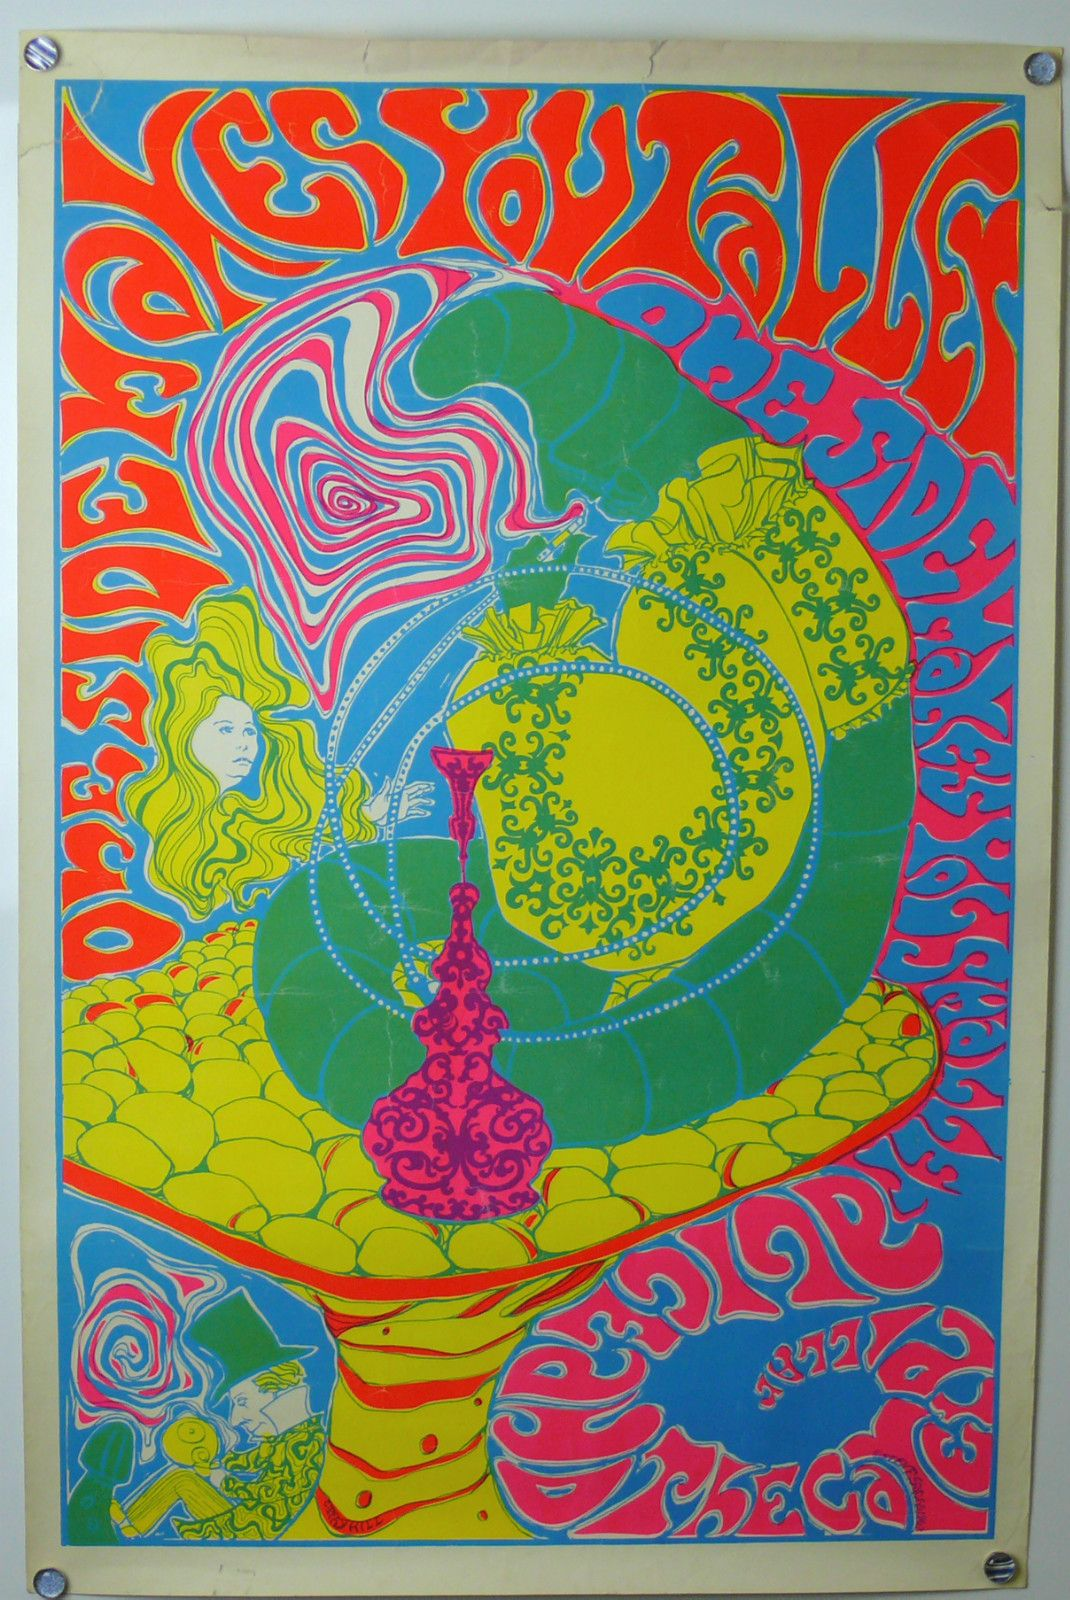 Alice In Wonderland Original Psychedelic Poster 1967 Fluorescent